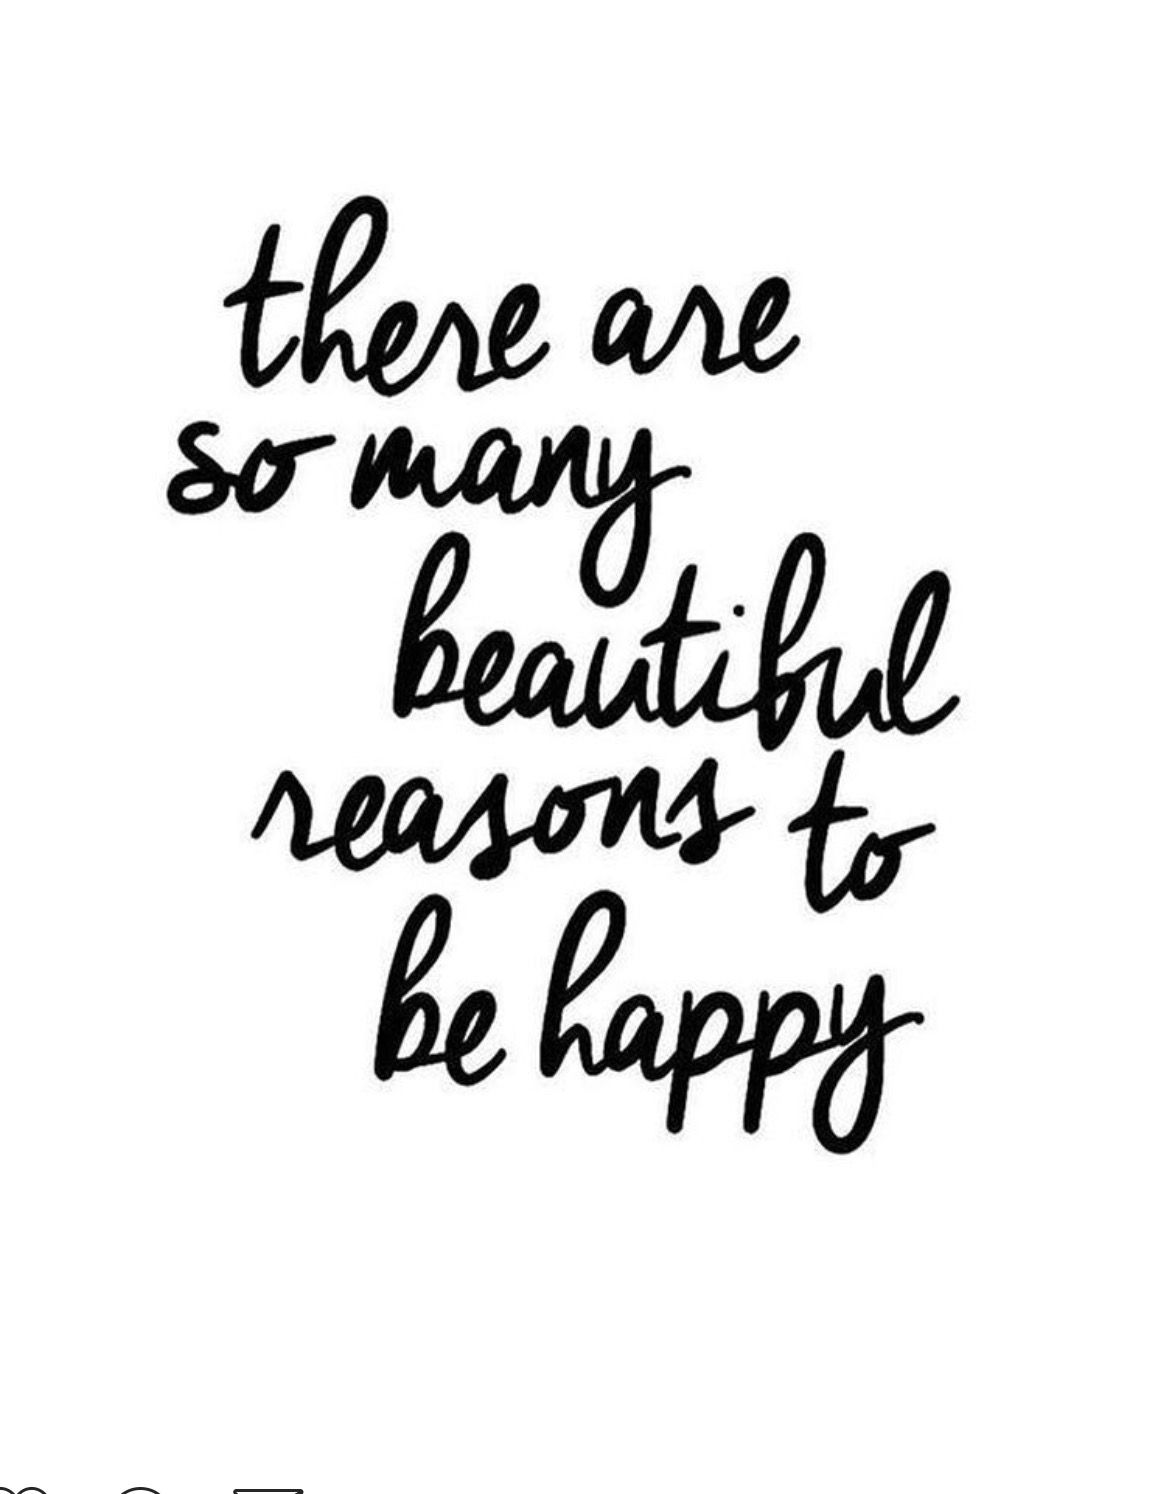 Happy Positive Quotes Pinvanessa Tondreau On Digital Scrapbooking Quotes  Pinterest